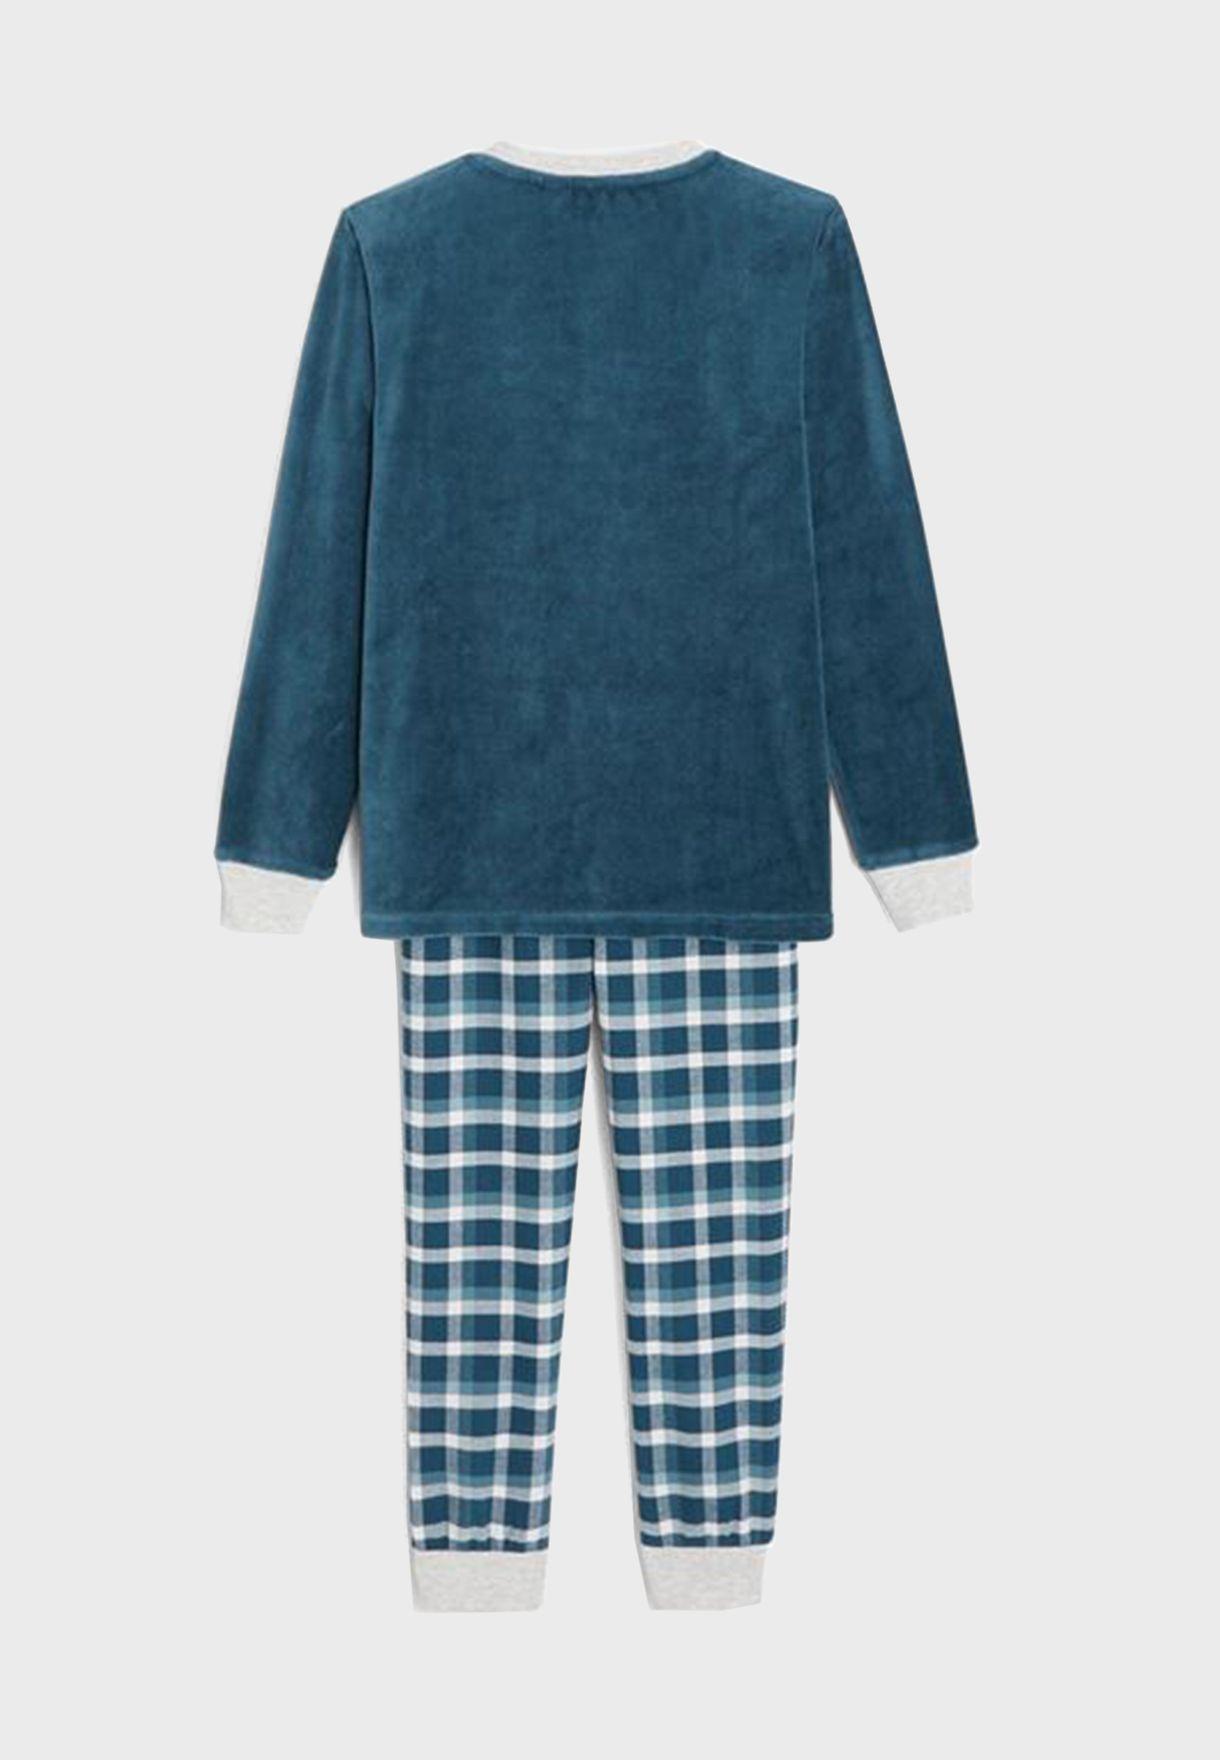 Kids Graphic T-Shirt + Pyjama Set